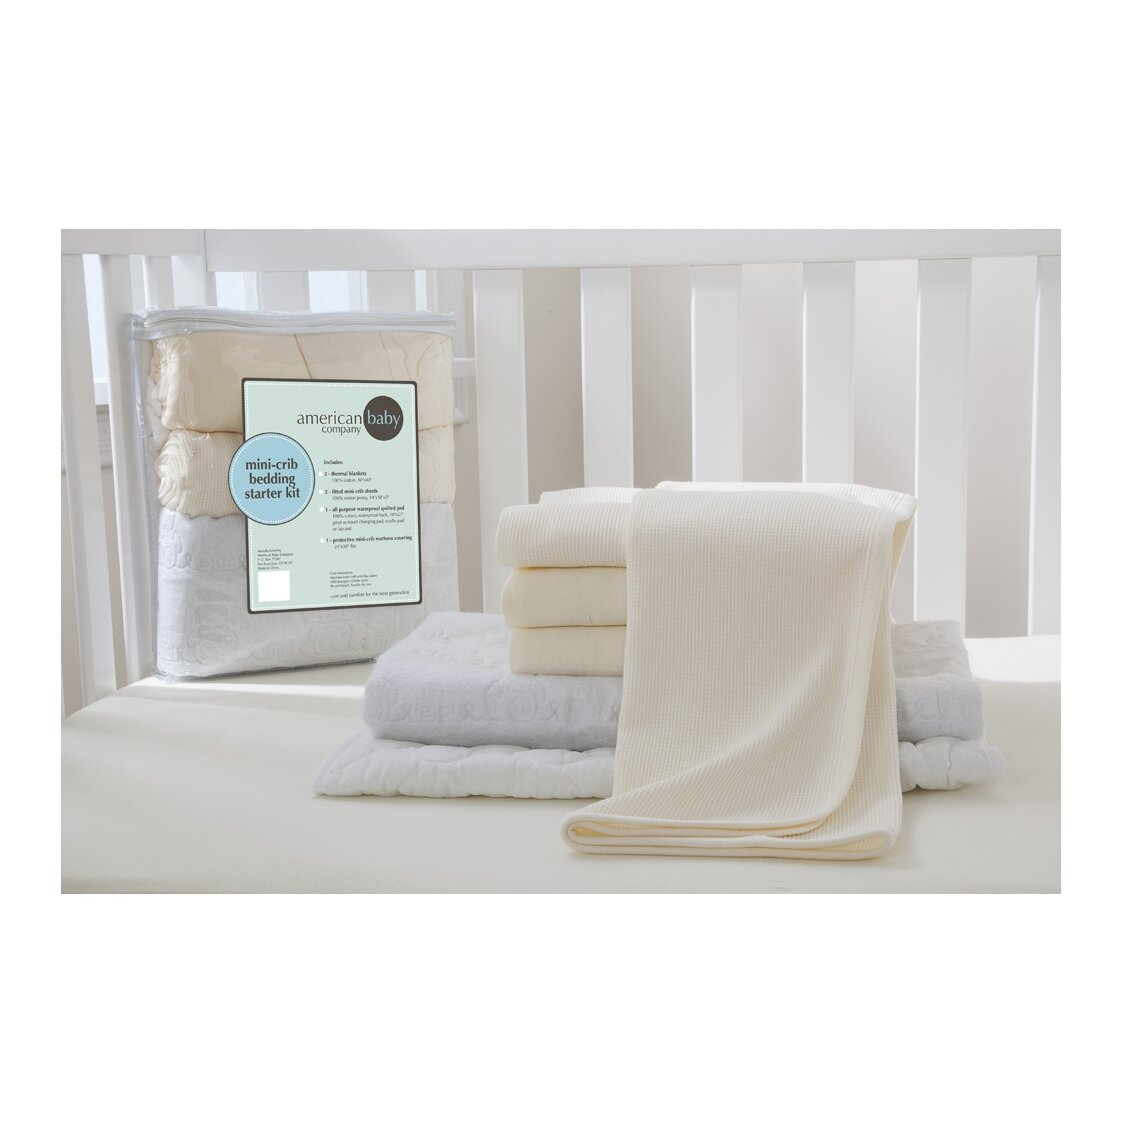 Crib for sale orlando fl - American Baby Company Portable Mini Starter 6 Piece Crib Bedding Set